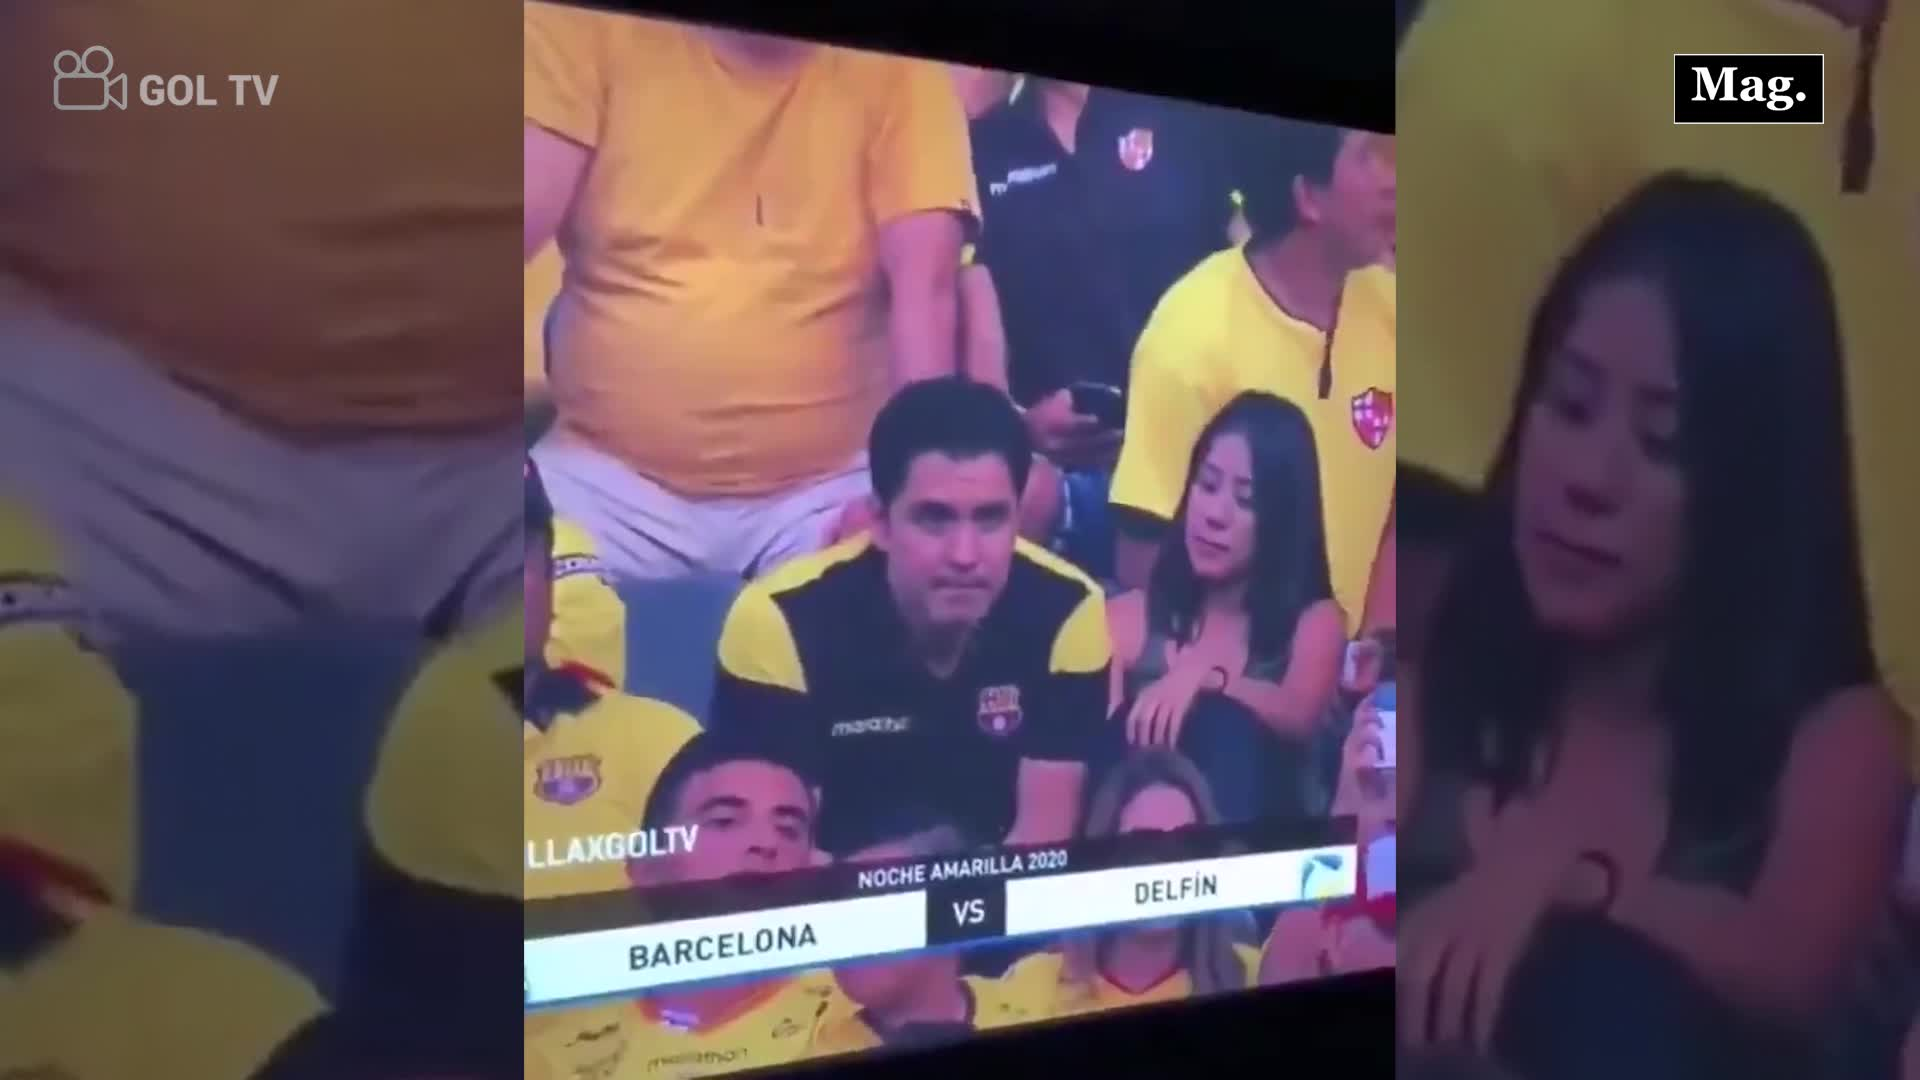 Descubren infidelidad de joven durante un partido de fútbol en Ecuador